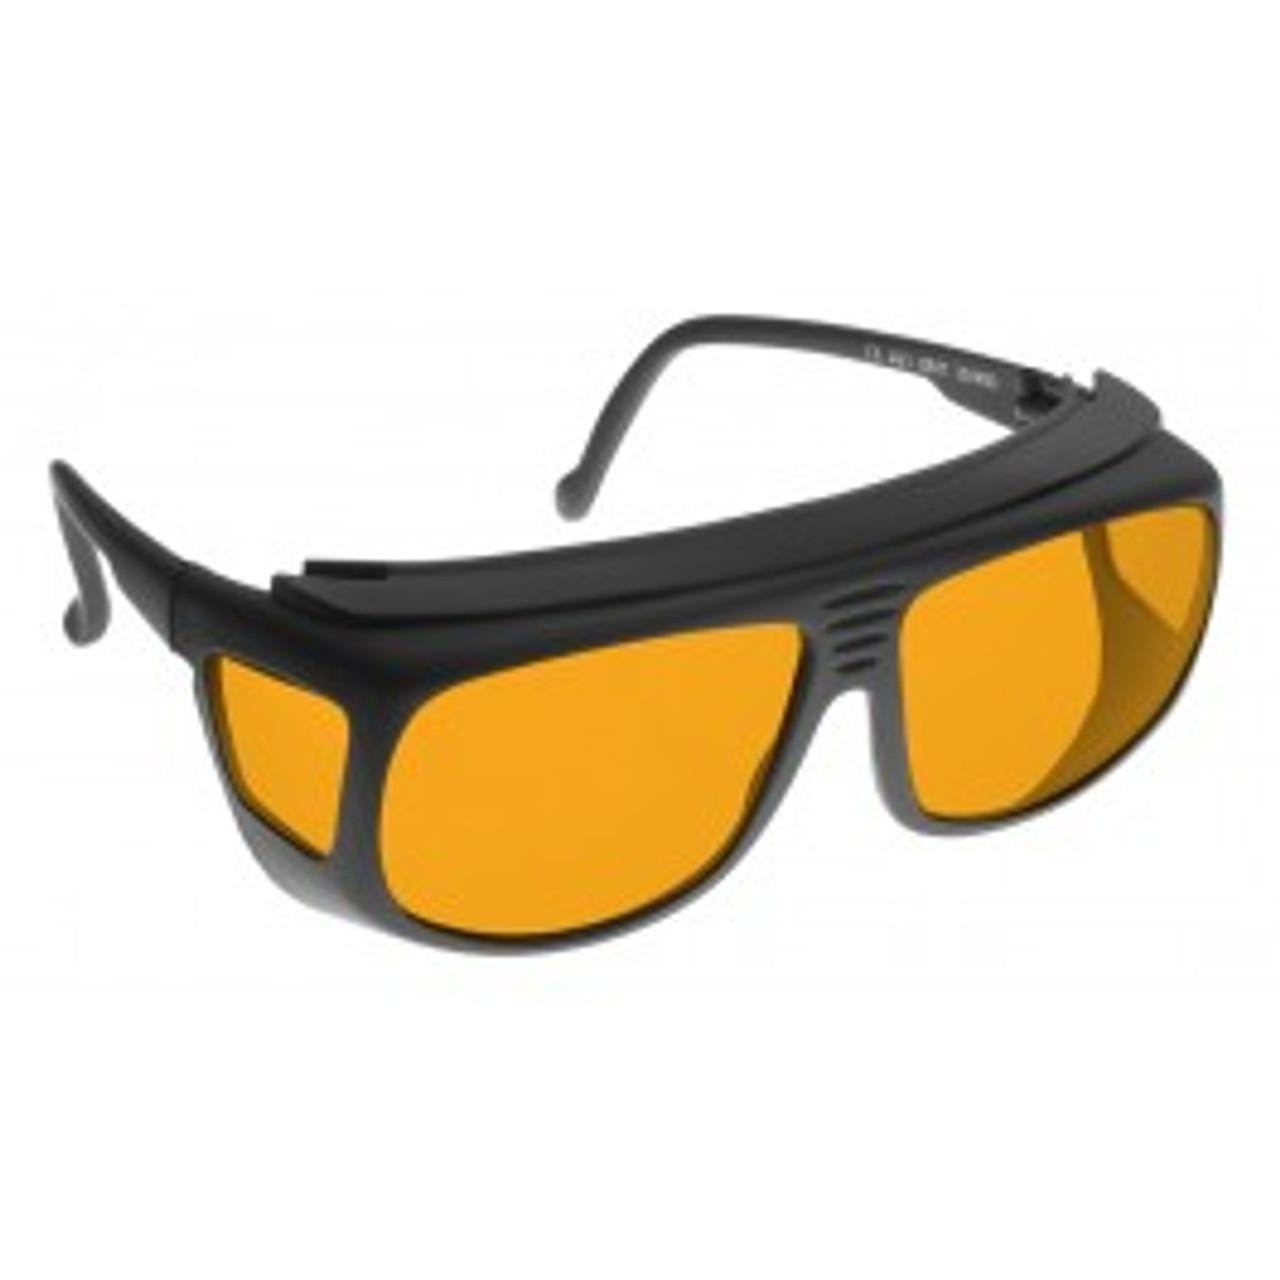 NoIR 48% Orange SpectraShield Small 460-31